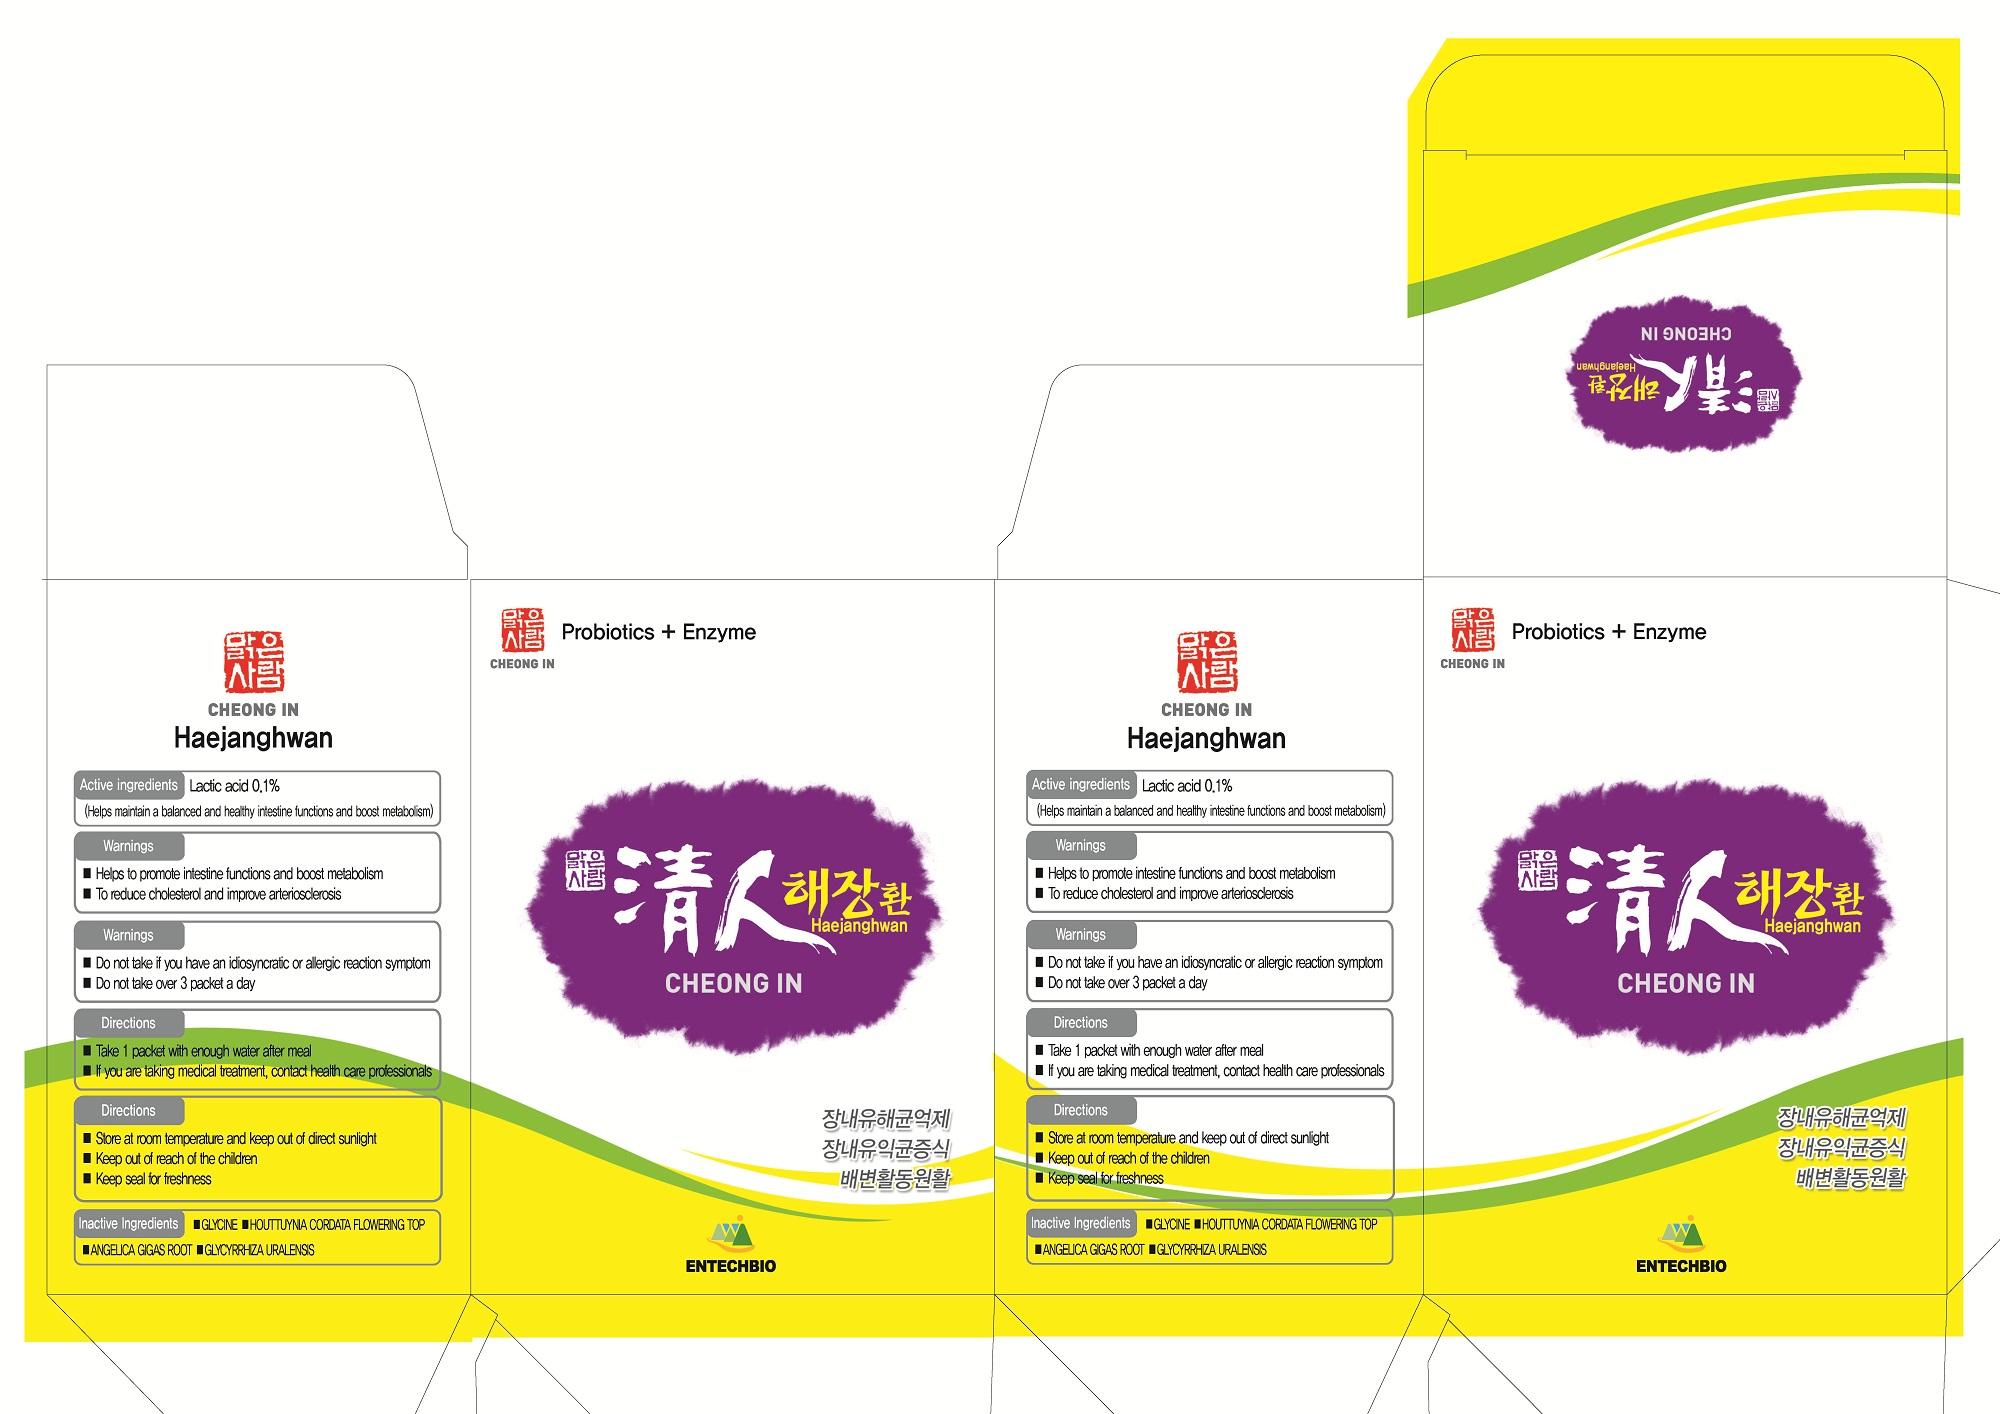 Cheongin Haejanghwan (Lactic Acid) Pellet [Entechbio Co., Ltd]